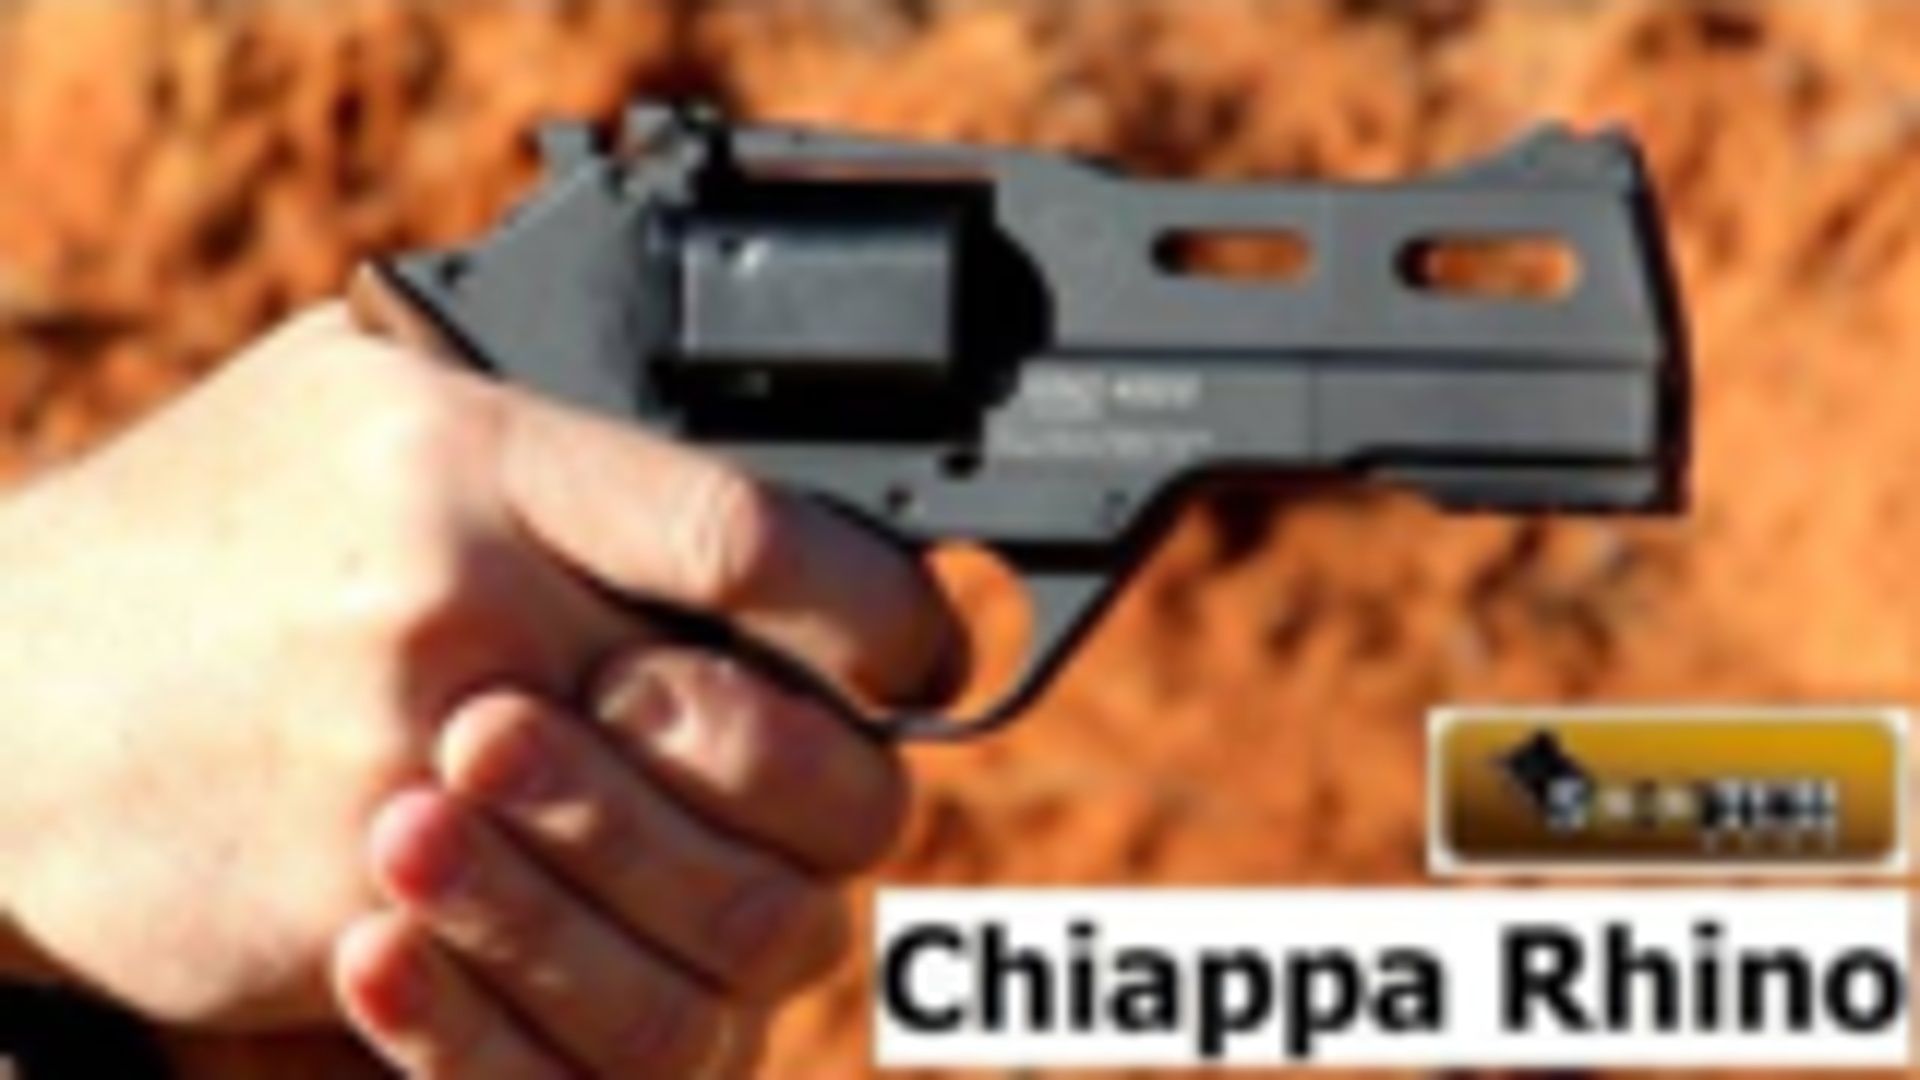 [sootch00]齐帕亚犀牛357马格南左轮手枪